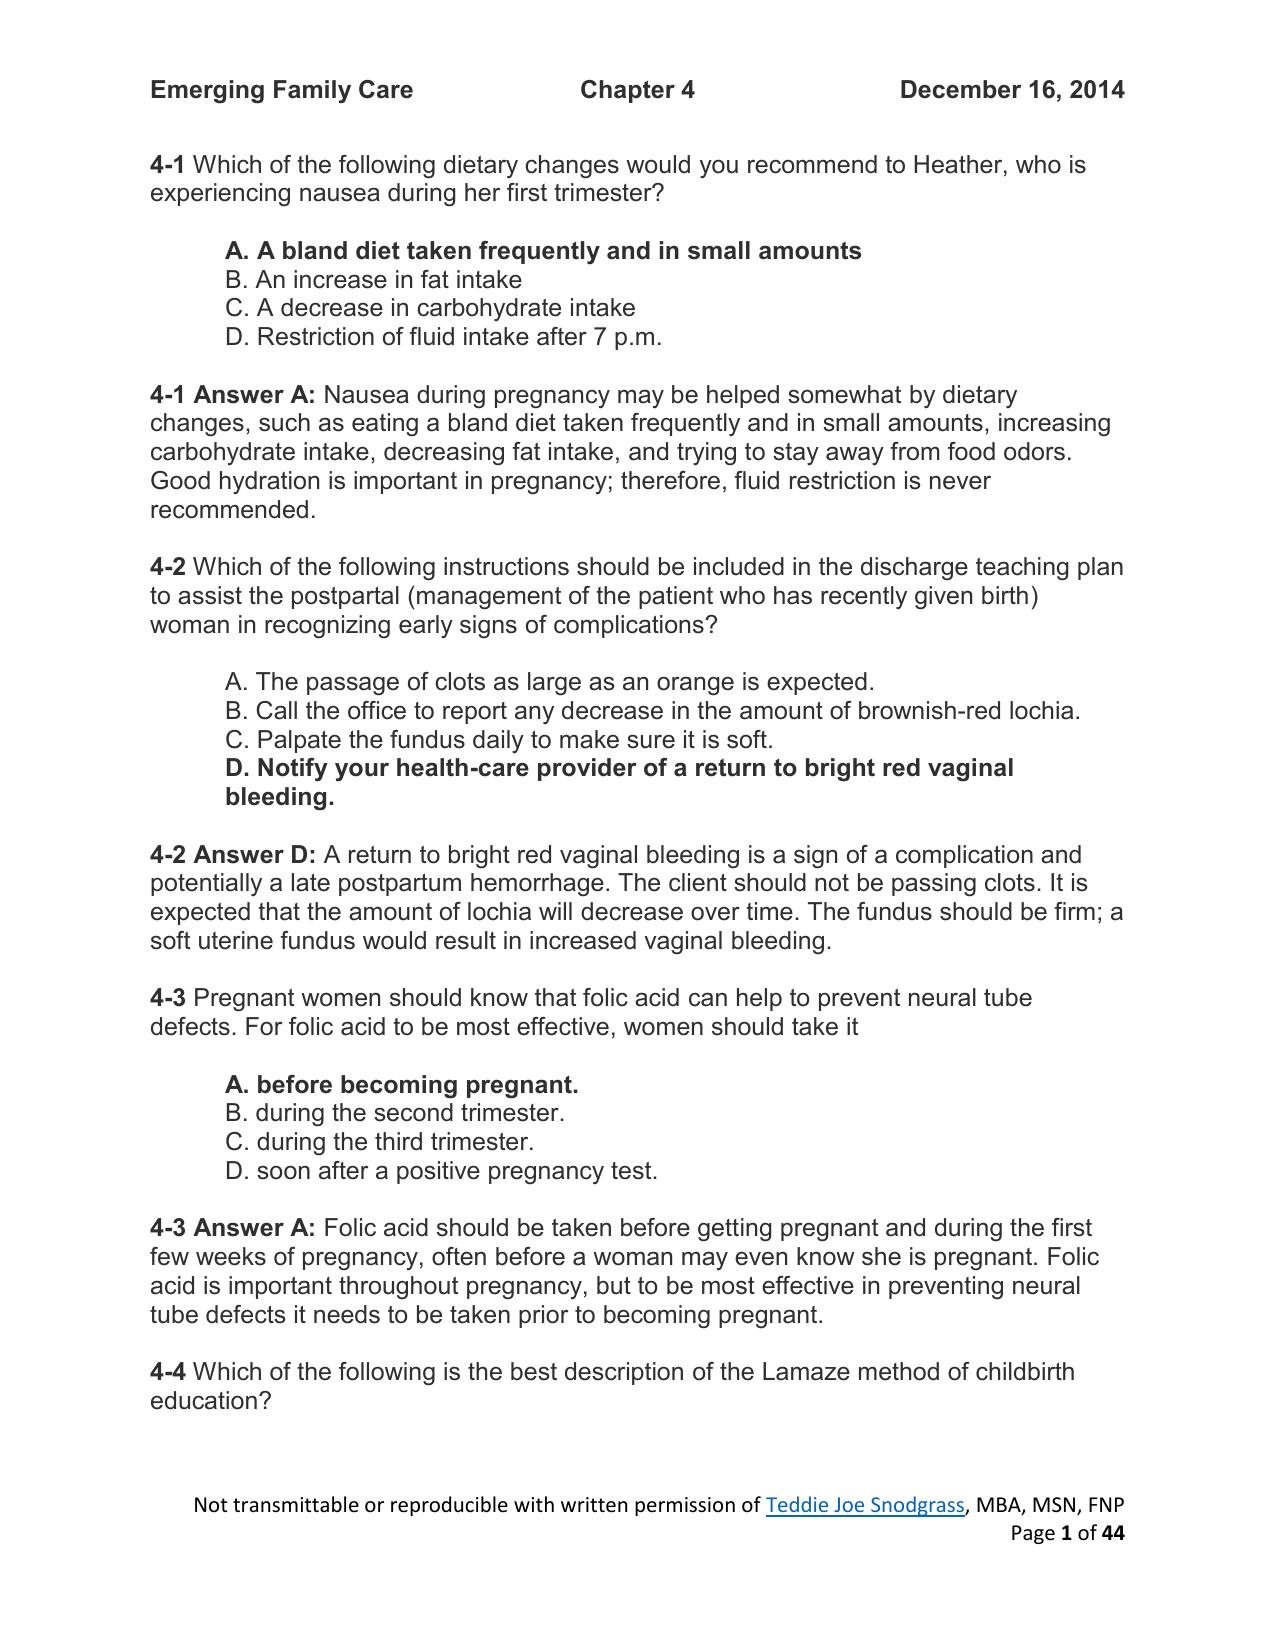 Emerging Family Exam - Teddie Joe Snodgrass, FNP